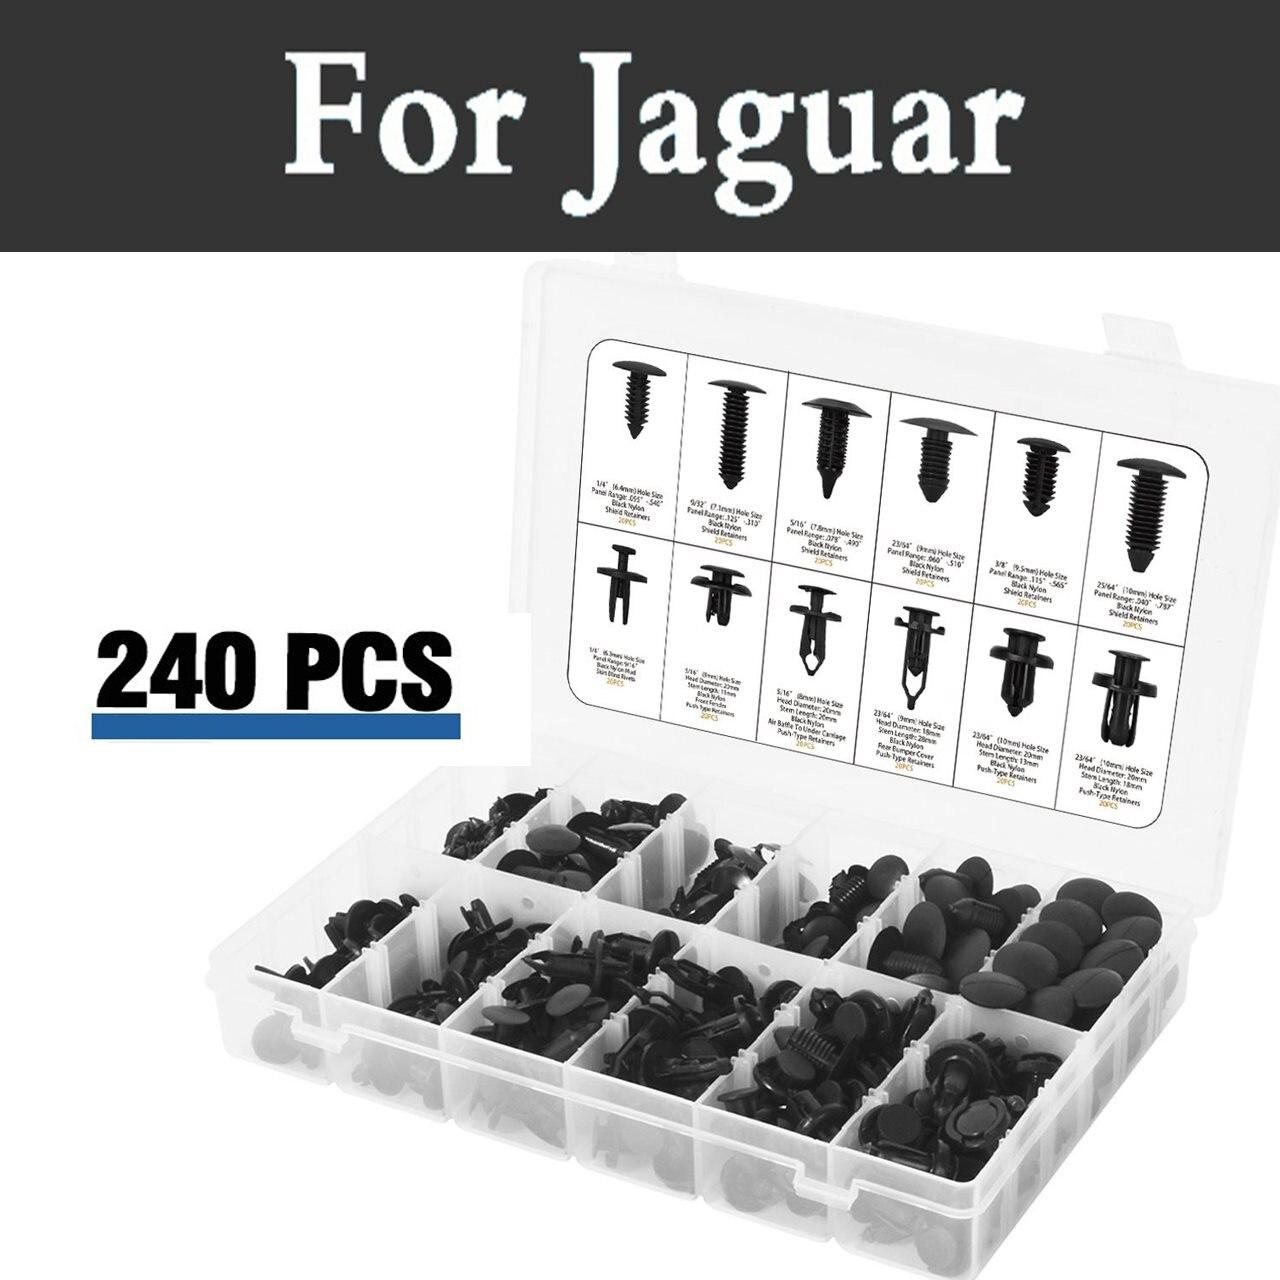 10X Jaguar XE XF Interior Bumper Push Trim Panel Fastener Clips 7-8mm